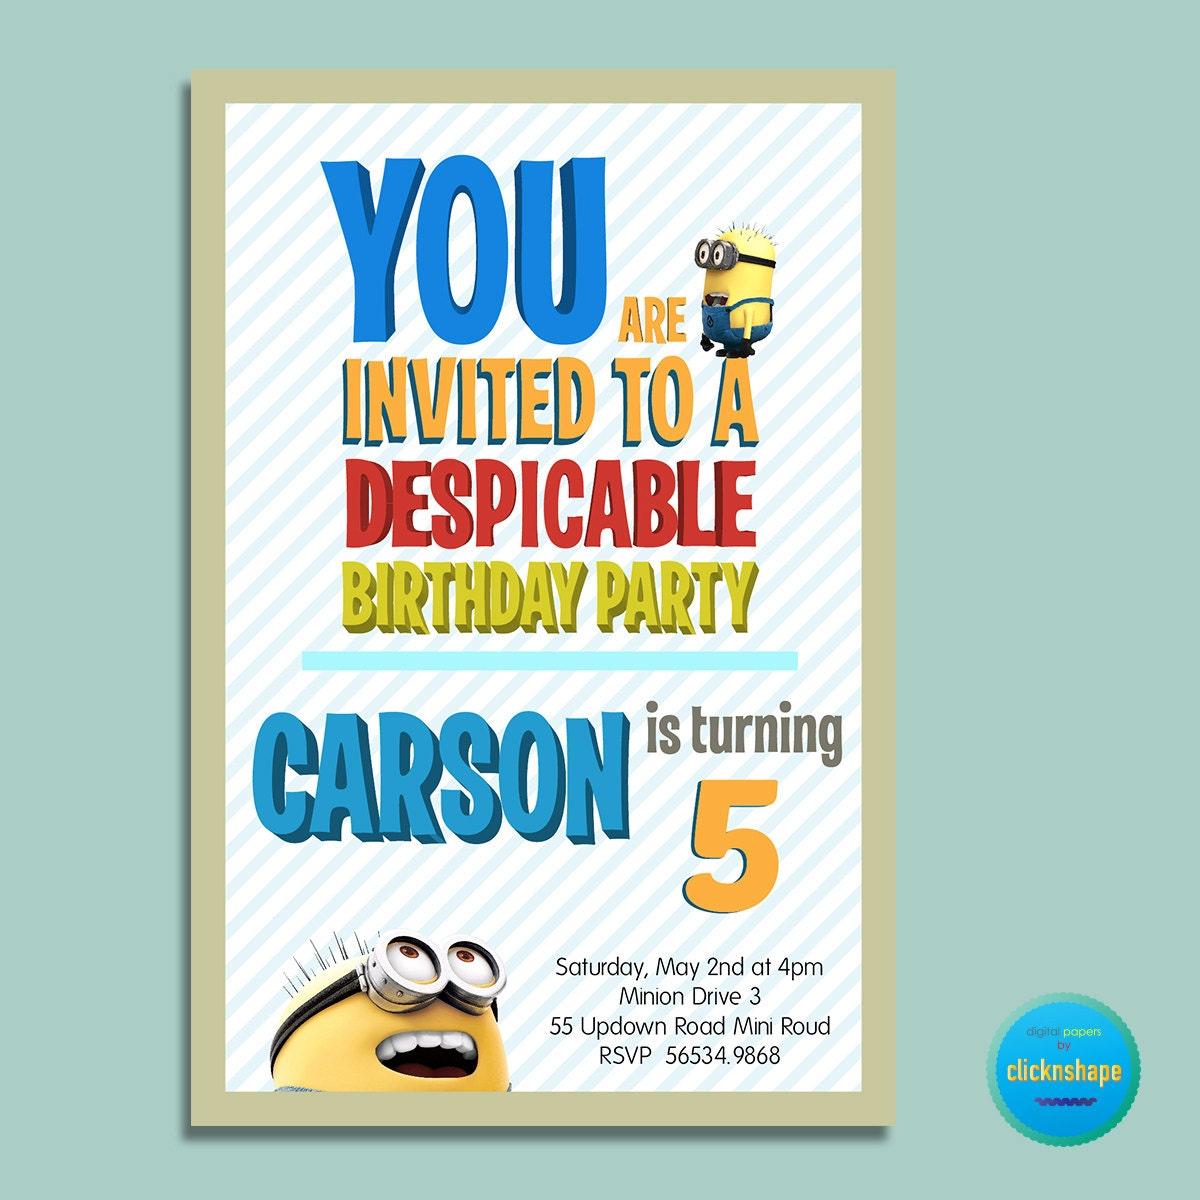 Minions Birthday Invitation for adorable invitation example